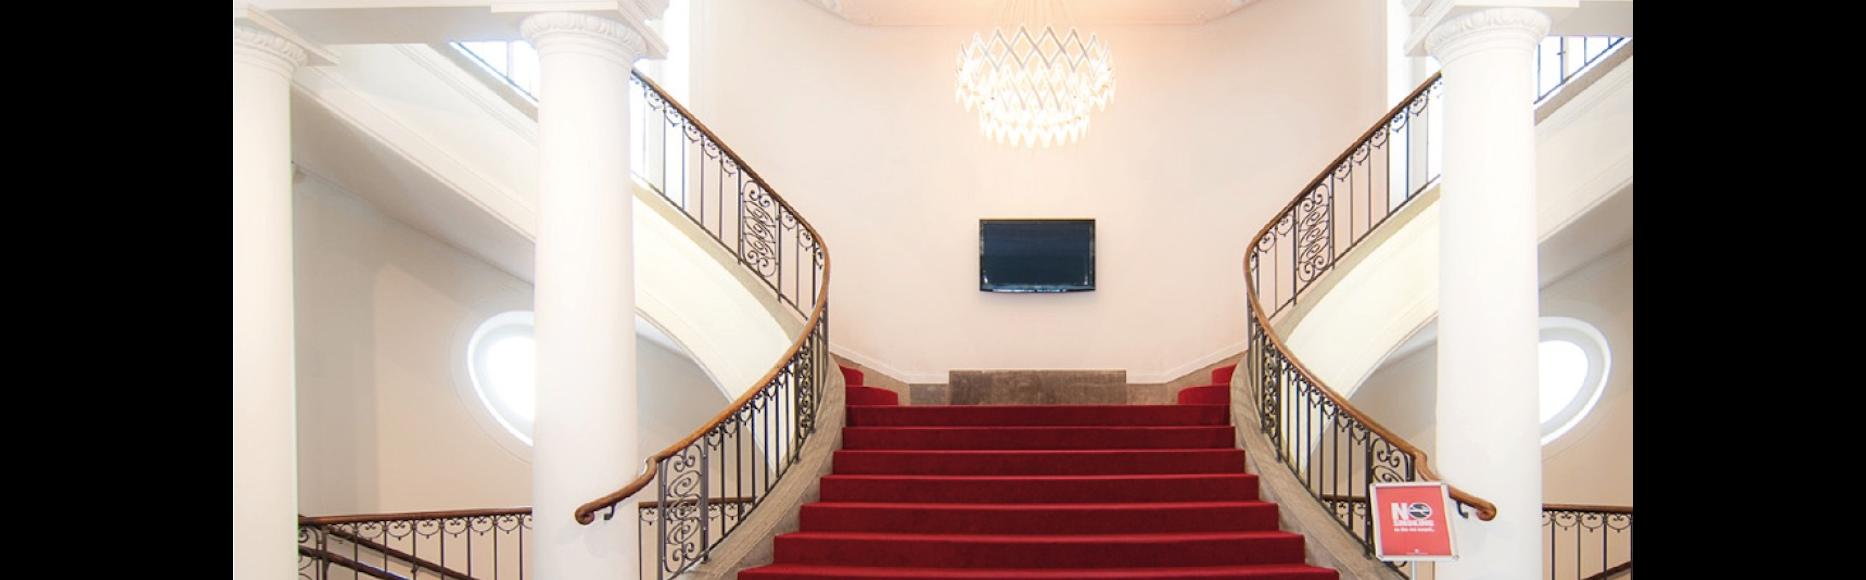 Treppenaufgang 1400x580_neu